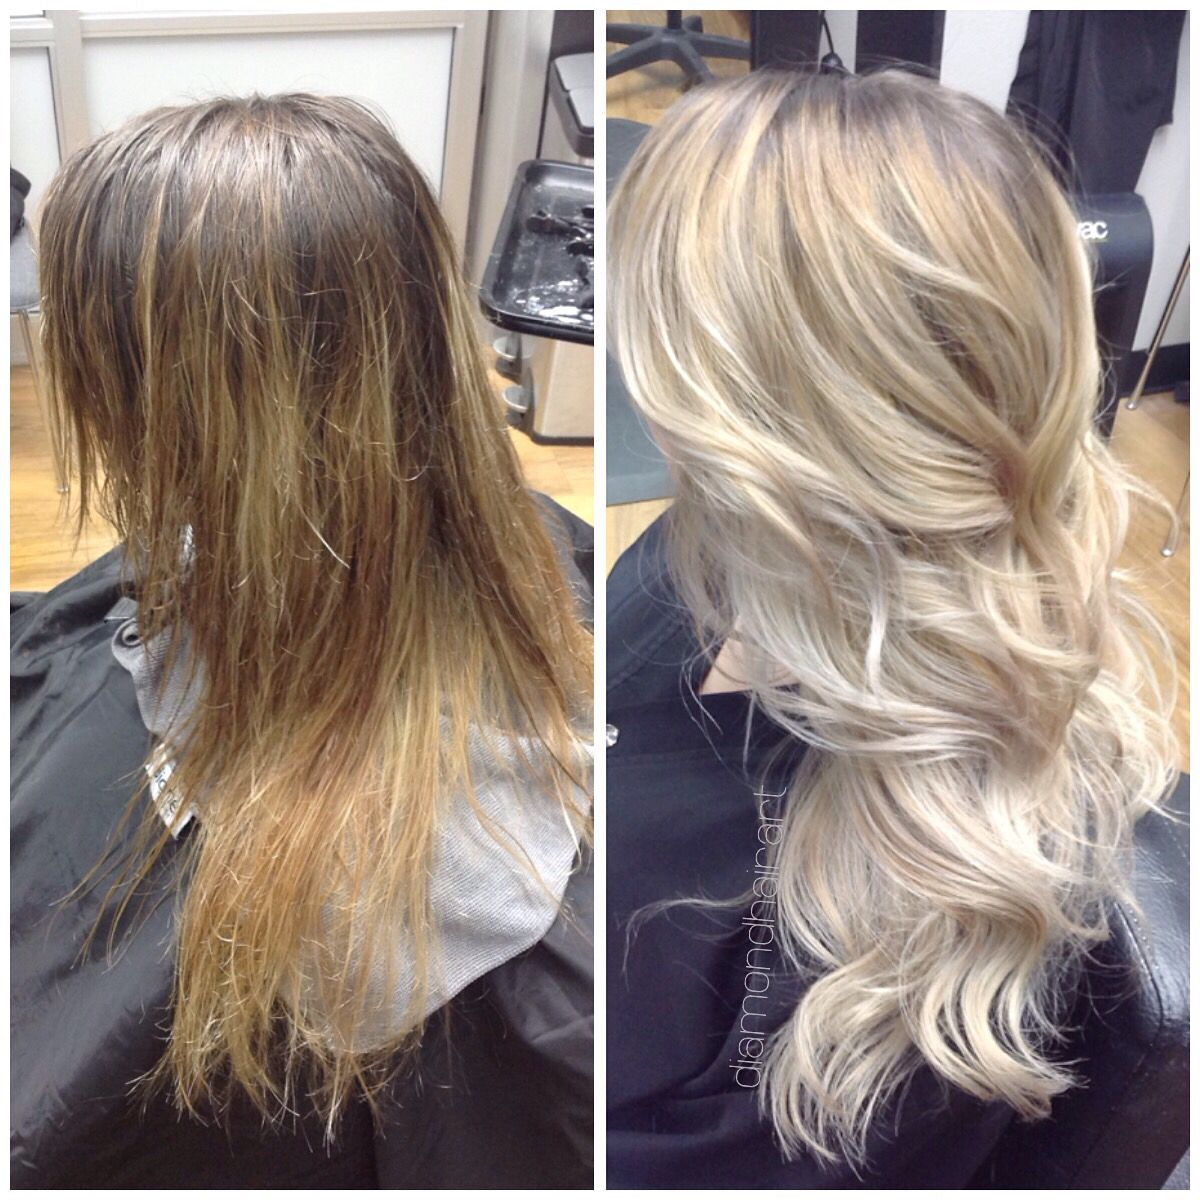 My Hair Before And After With Olaplex Hair In 2019 Hair Hair